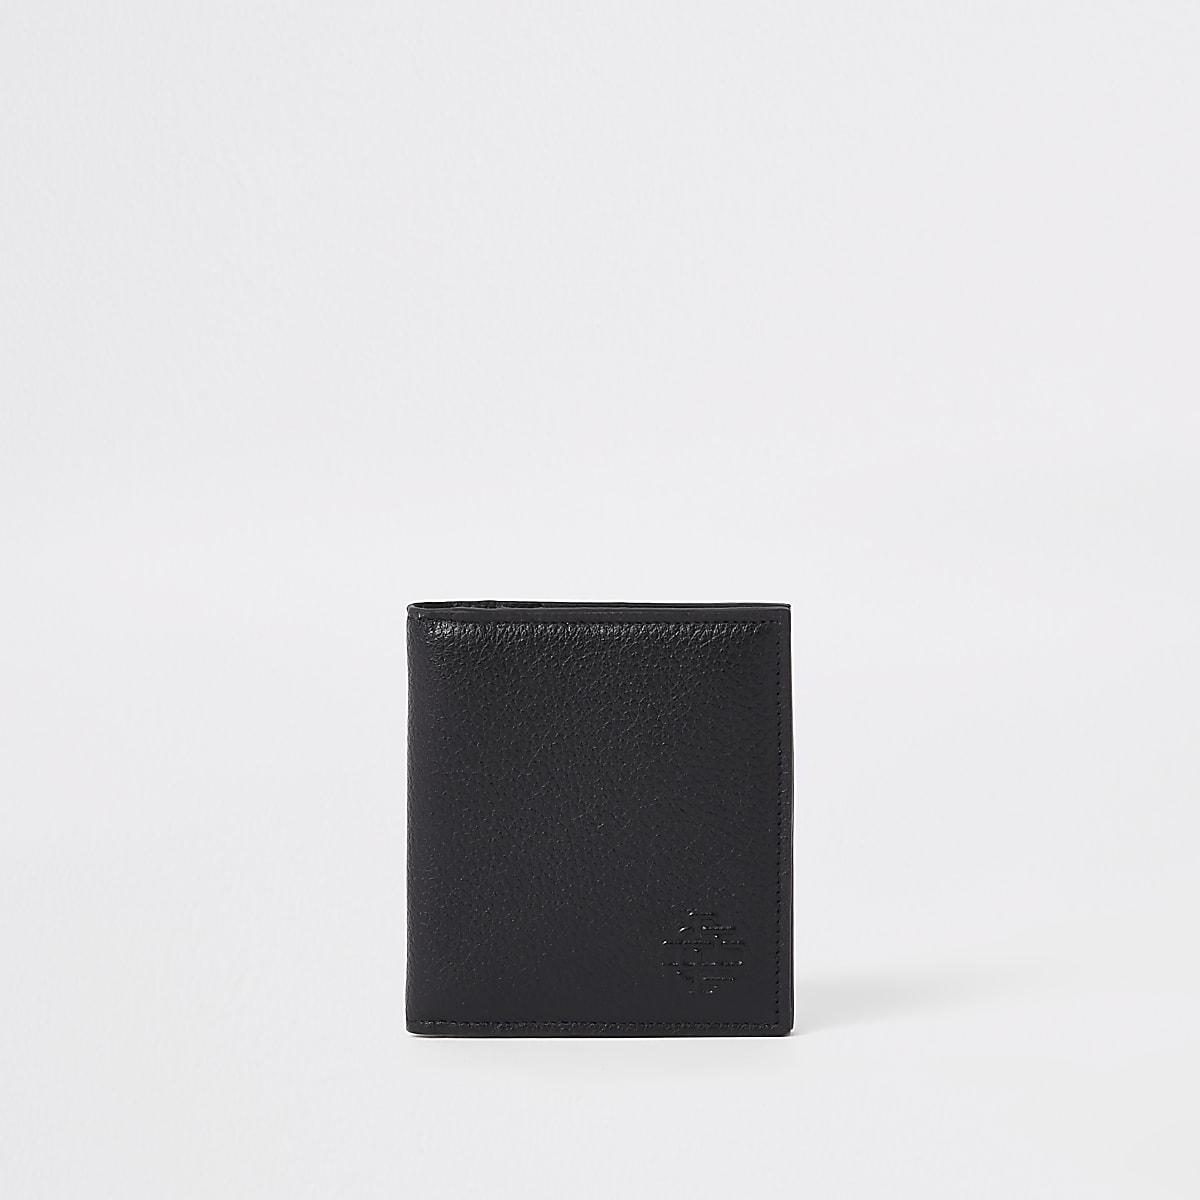 Schwarzes Kartenetui aus Leder